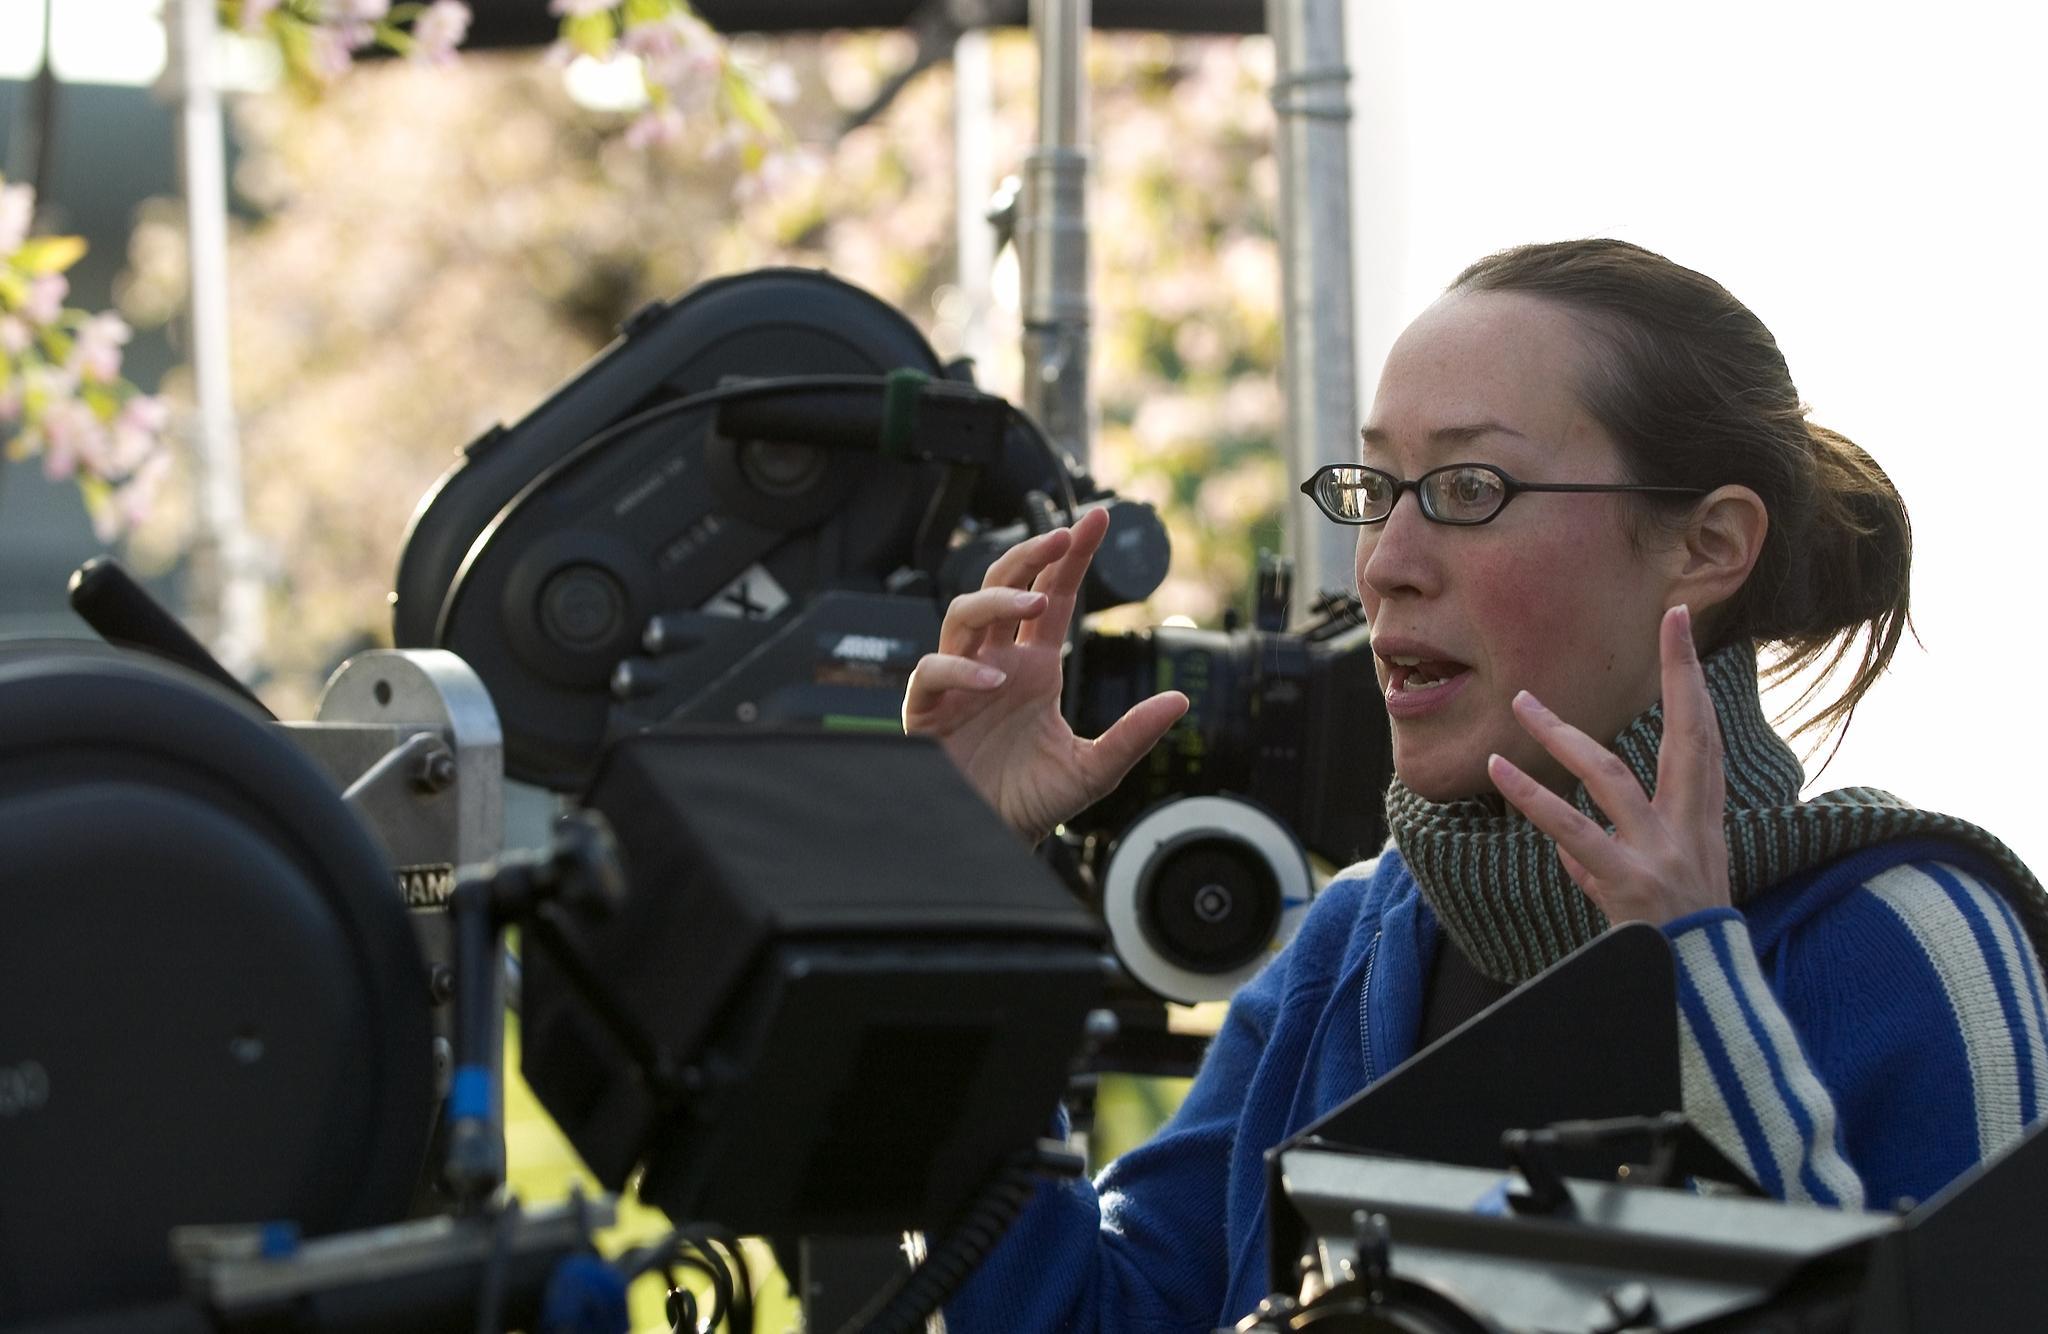 Karyn Kuysama directing a film ( IndieWire.com)